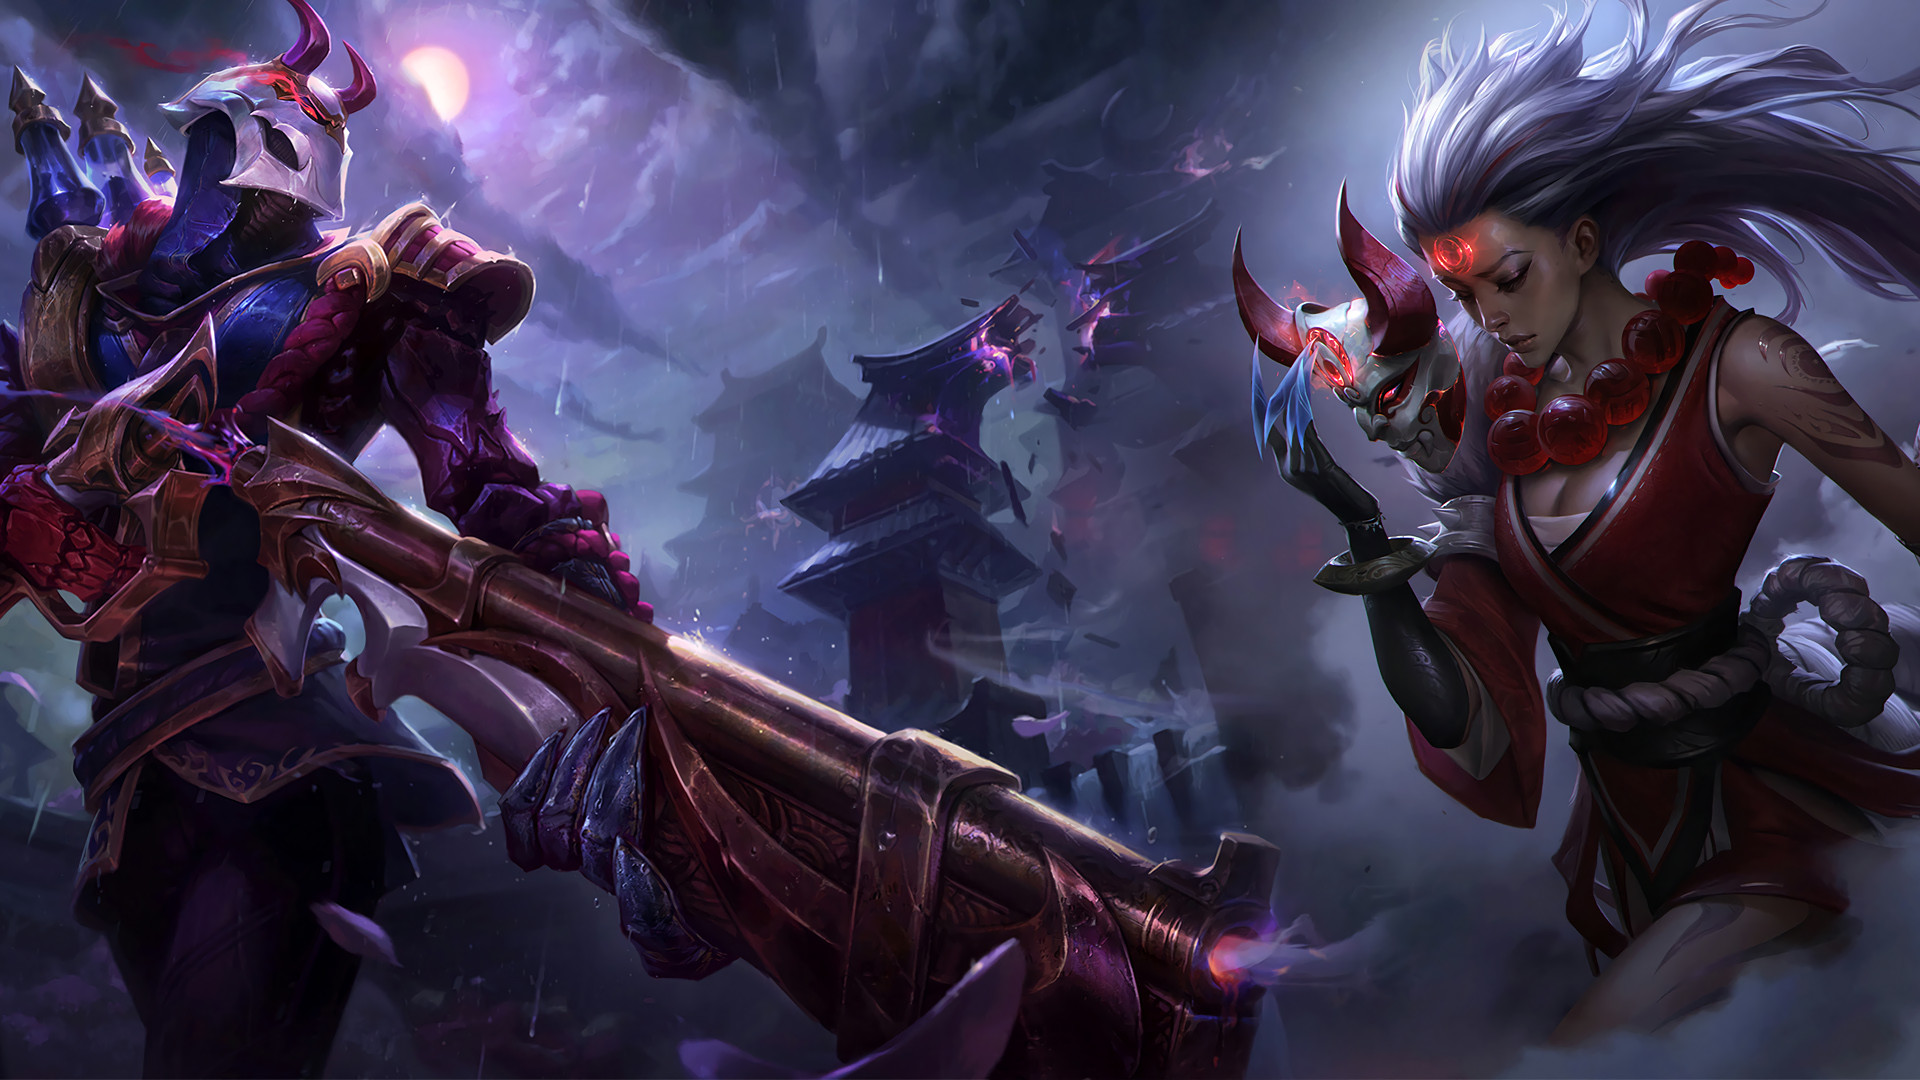 Blood Moon Jhin & Diana by Xilixir Splash Art League of Legends Artwork  Wallpaper lol